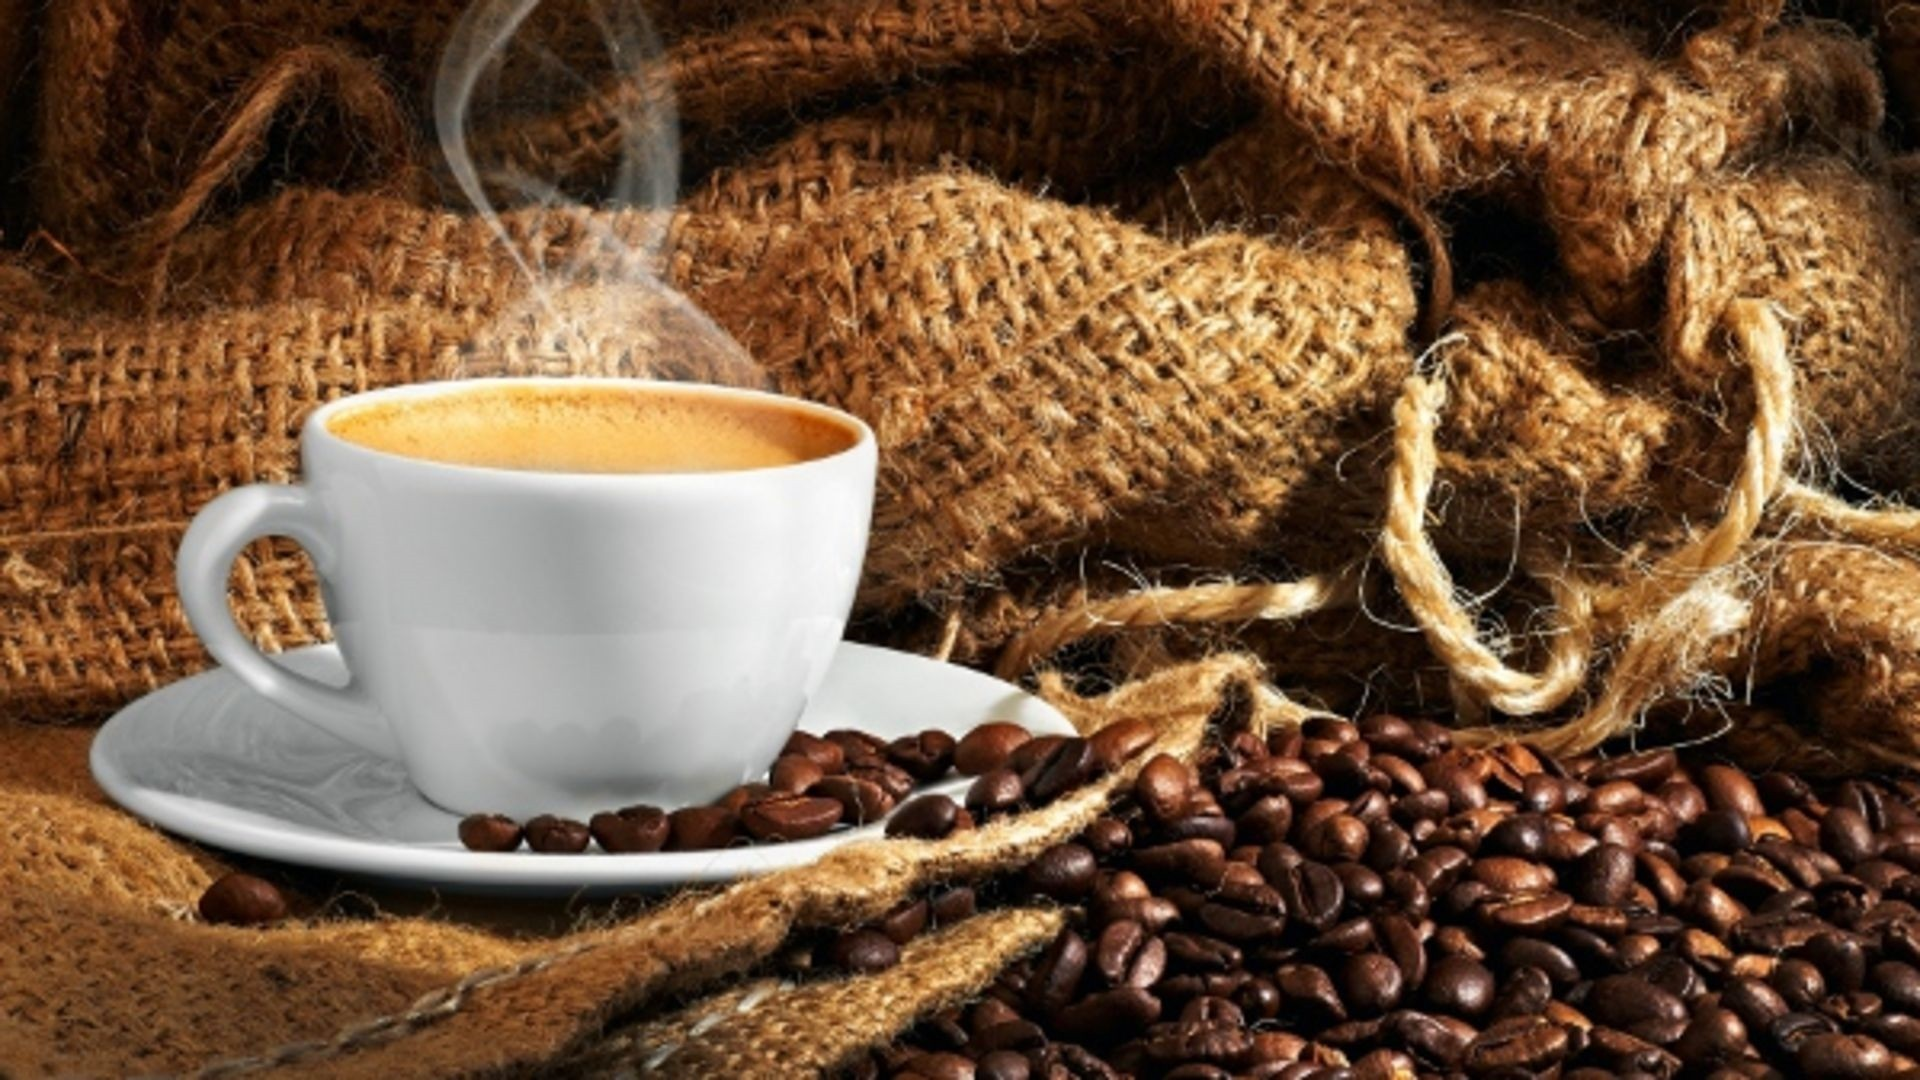 Coffee Wallpaper Picture hd